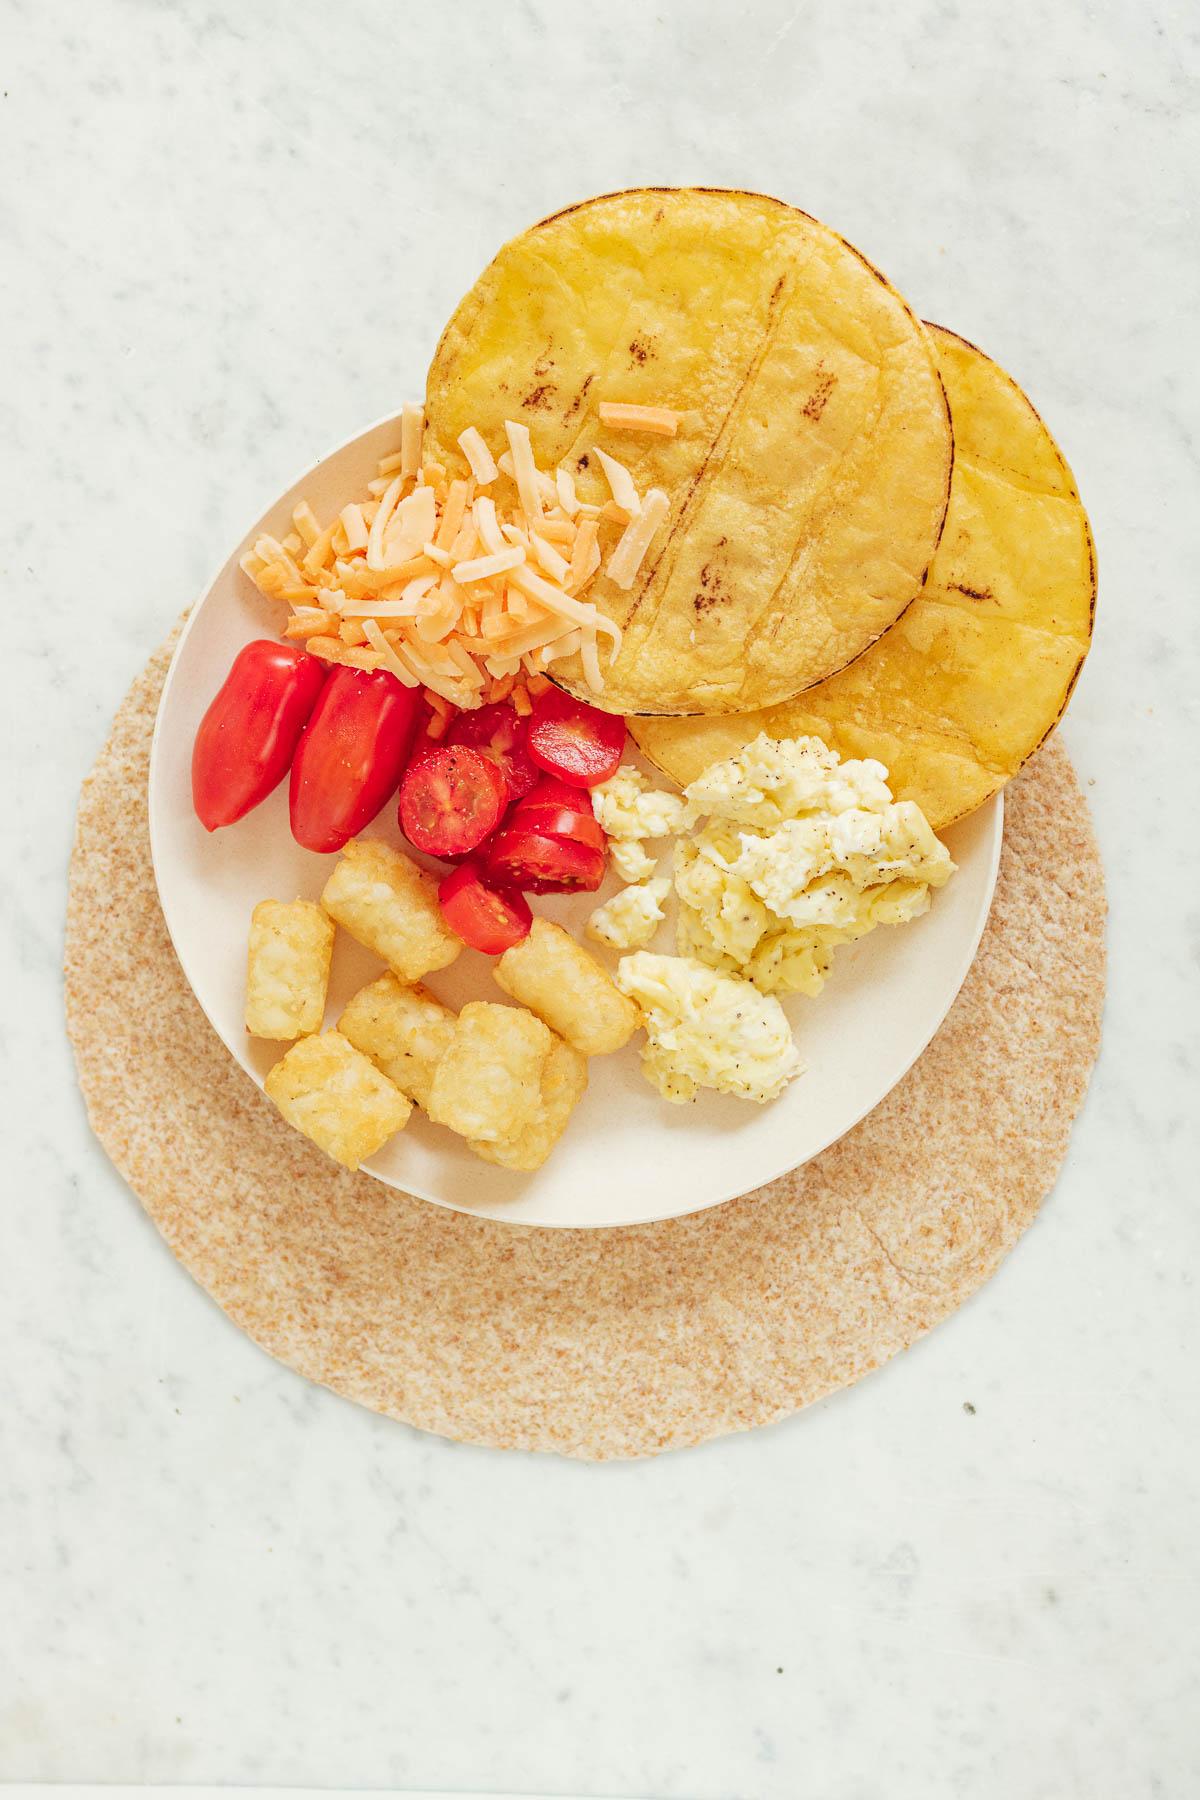 Breakfast Crunchwrap ingredients on a plate